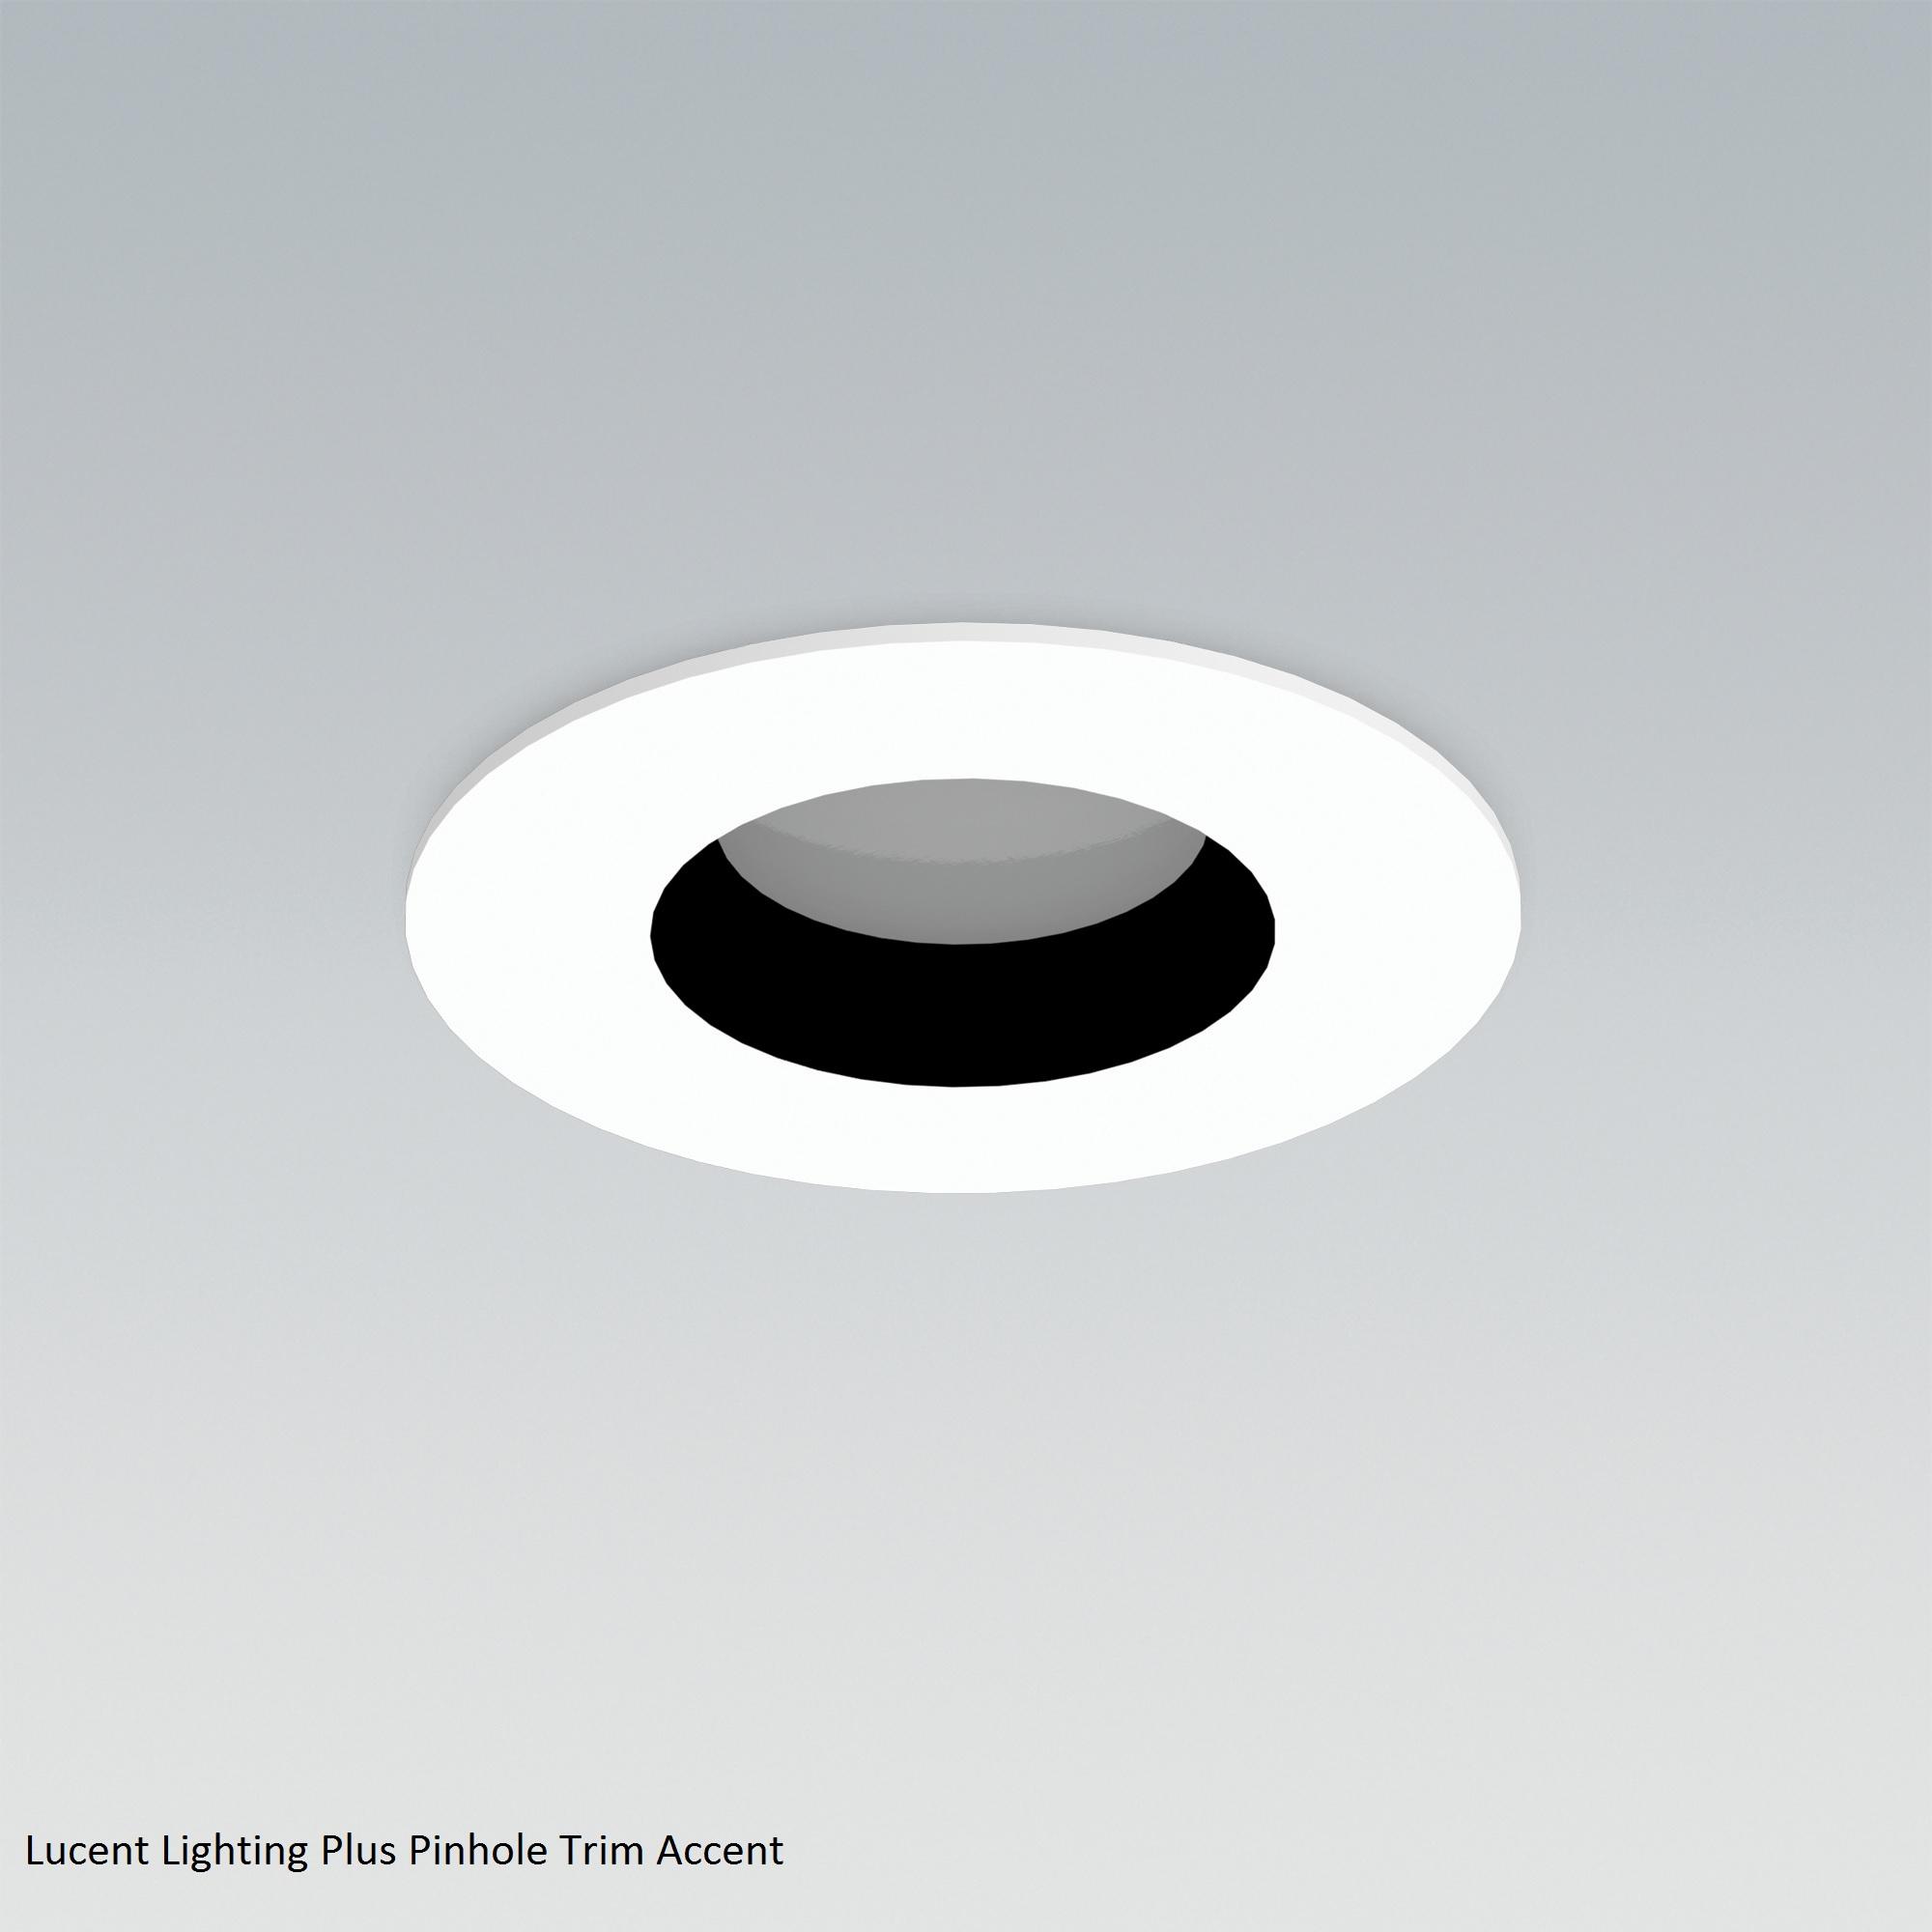 lucent-lighting-plus-pinhole-trim-accent